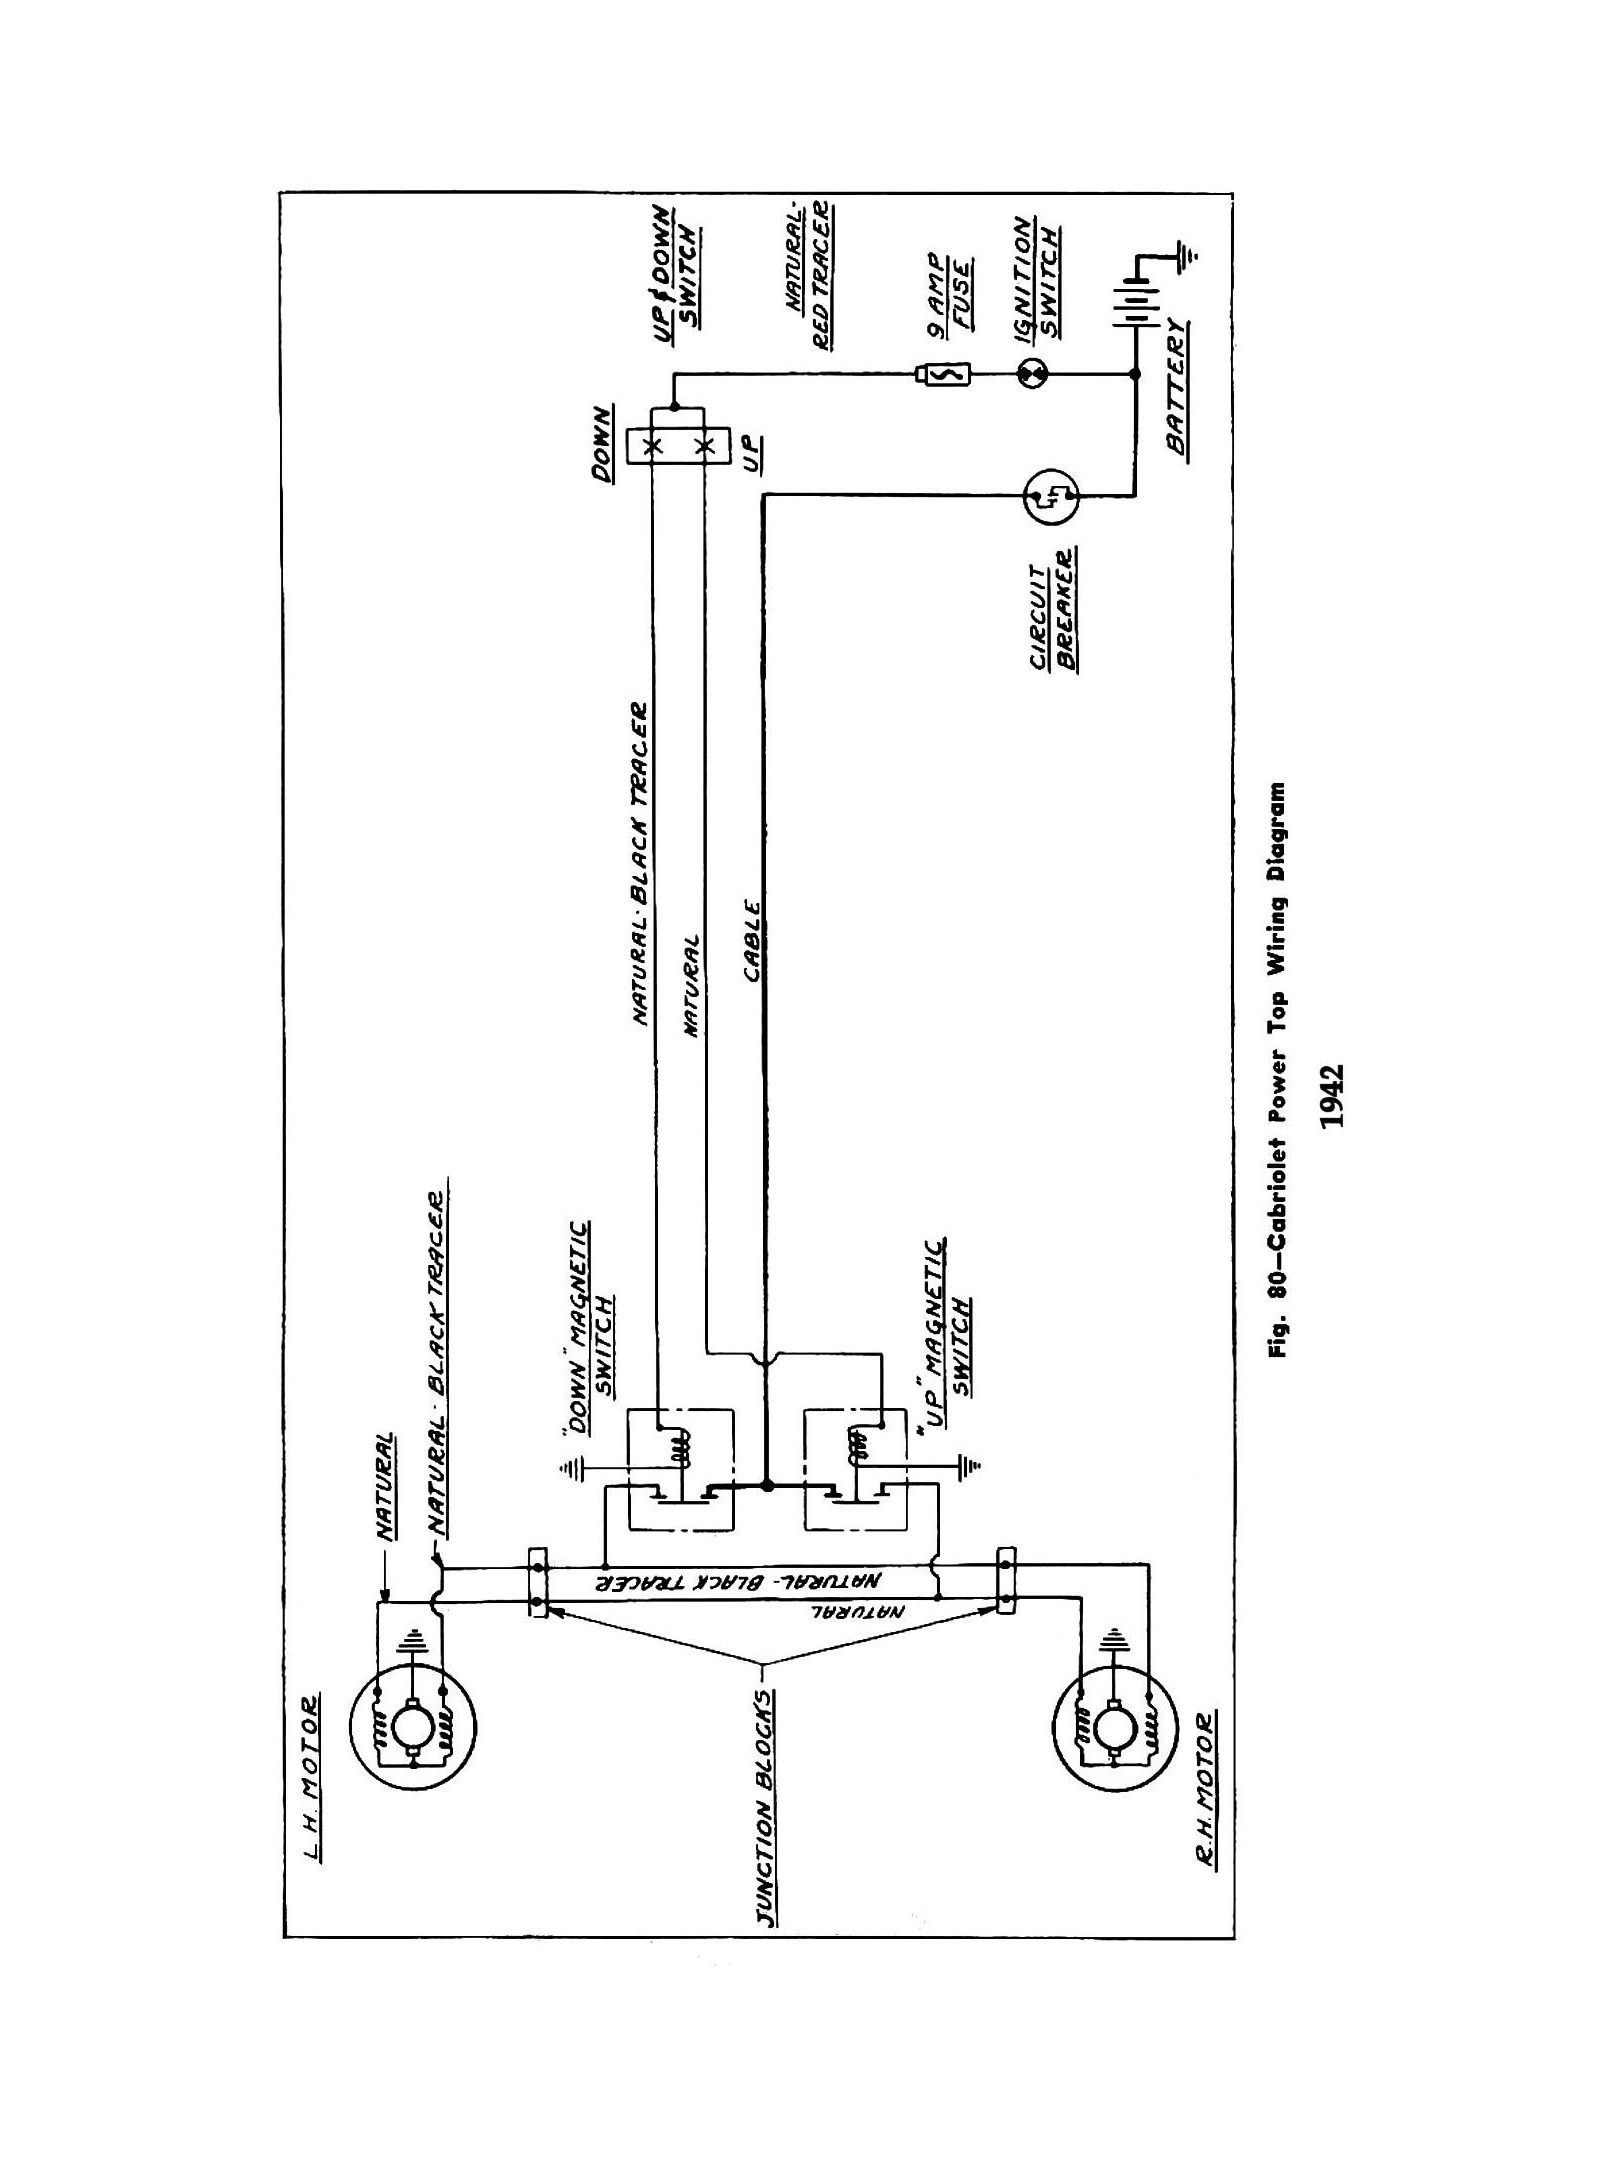 0d3gs Find Fuse Diagram 1994 Ford Econoline 150 Van 4 9 additionally P 0900c15280067210 also Bmw 325xi Engine Diagrams likewise Bmw Ews 3 Wiring Diagram also P 0900c1528008bf26. on 1992 bmw 325i wiring diagram